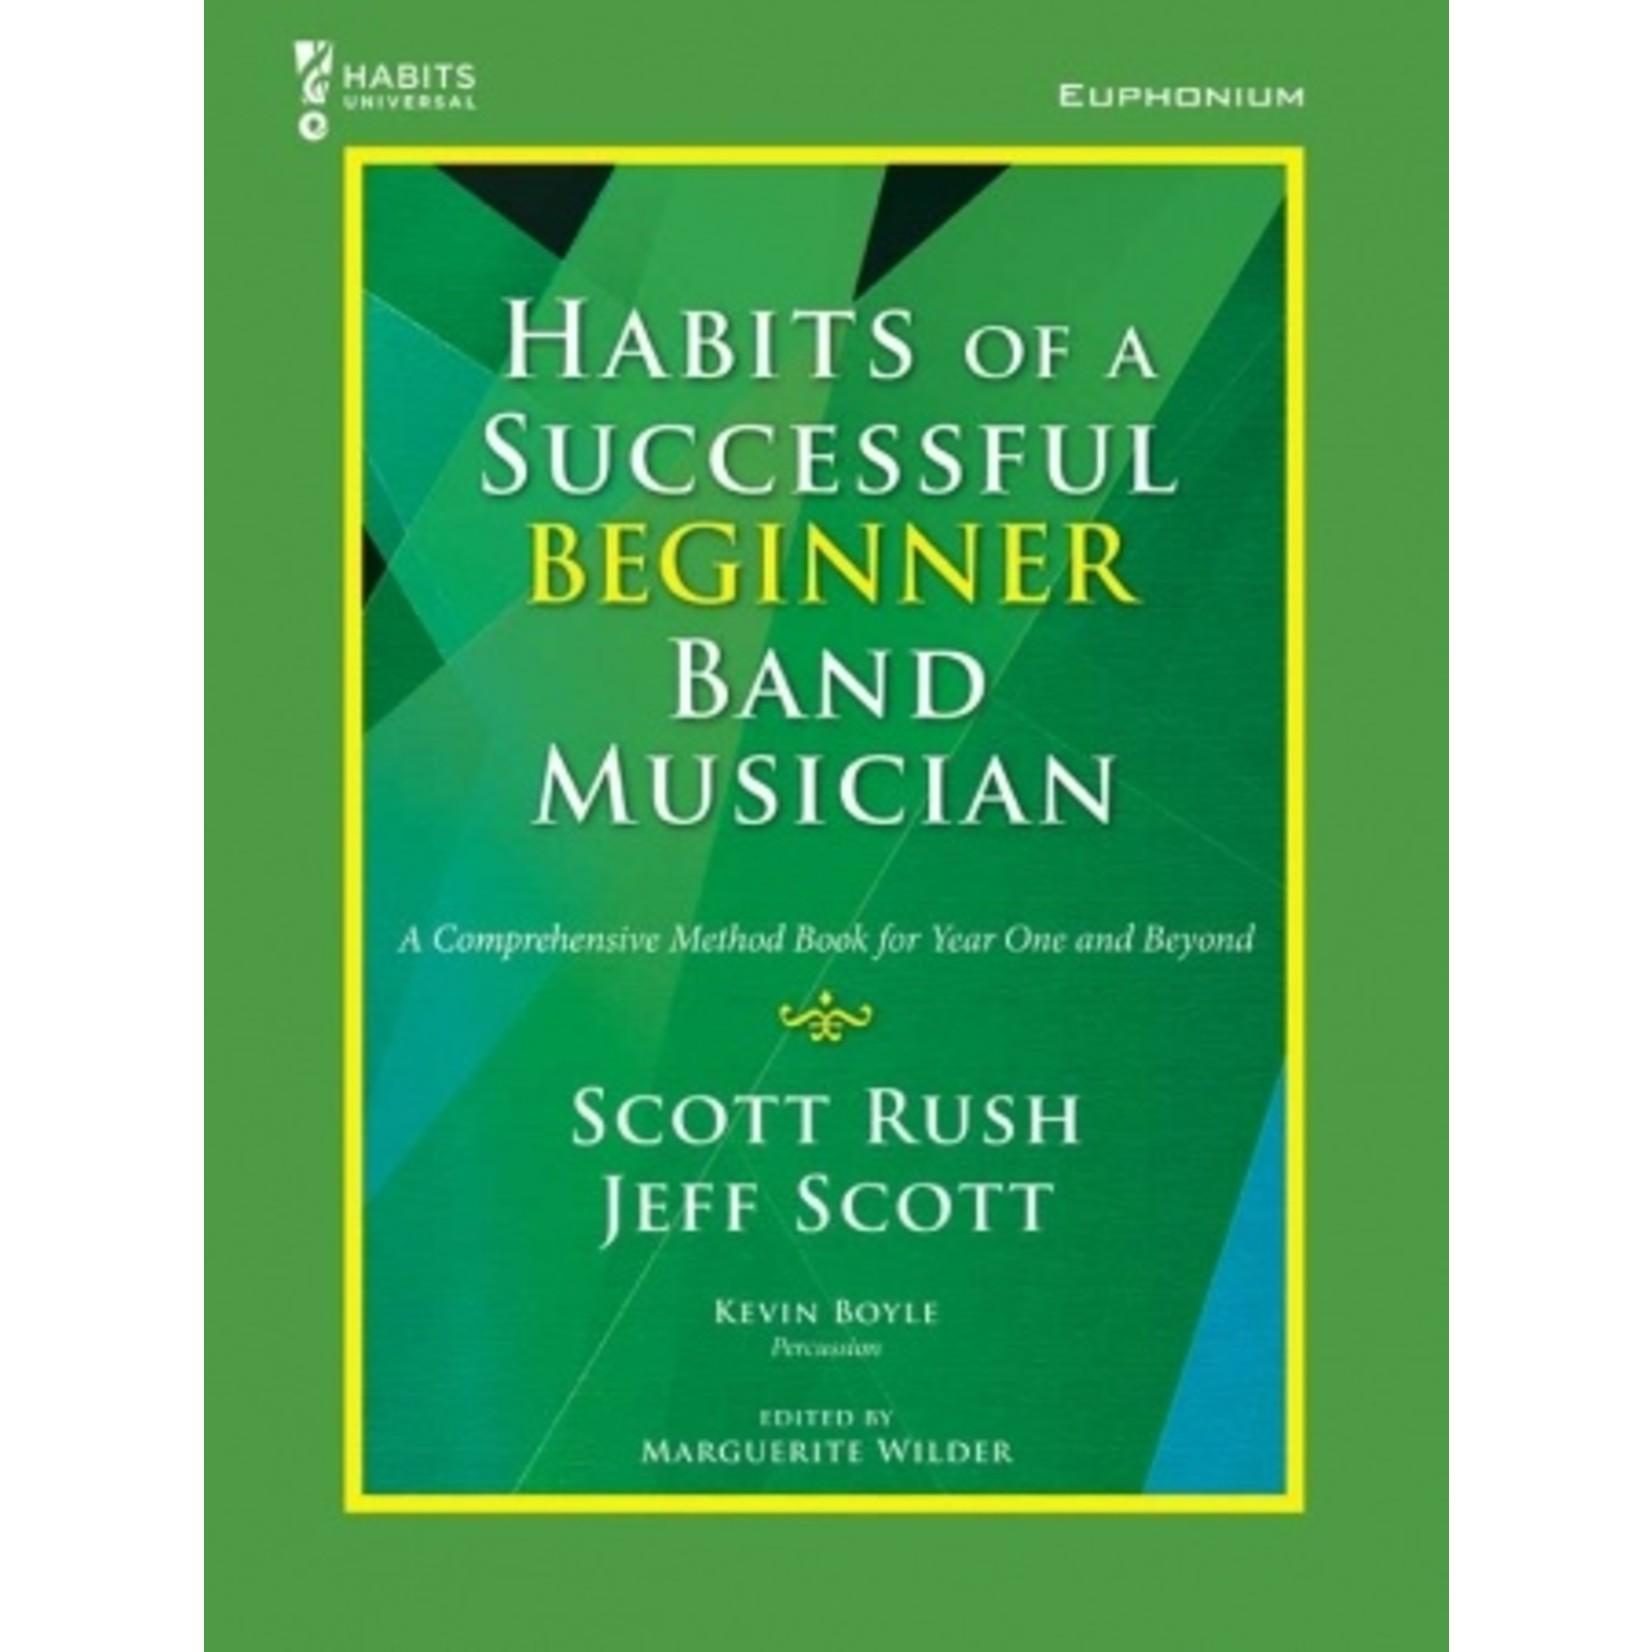 Habits of a Successful Beginner Band Musician - Euphonium